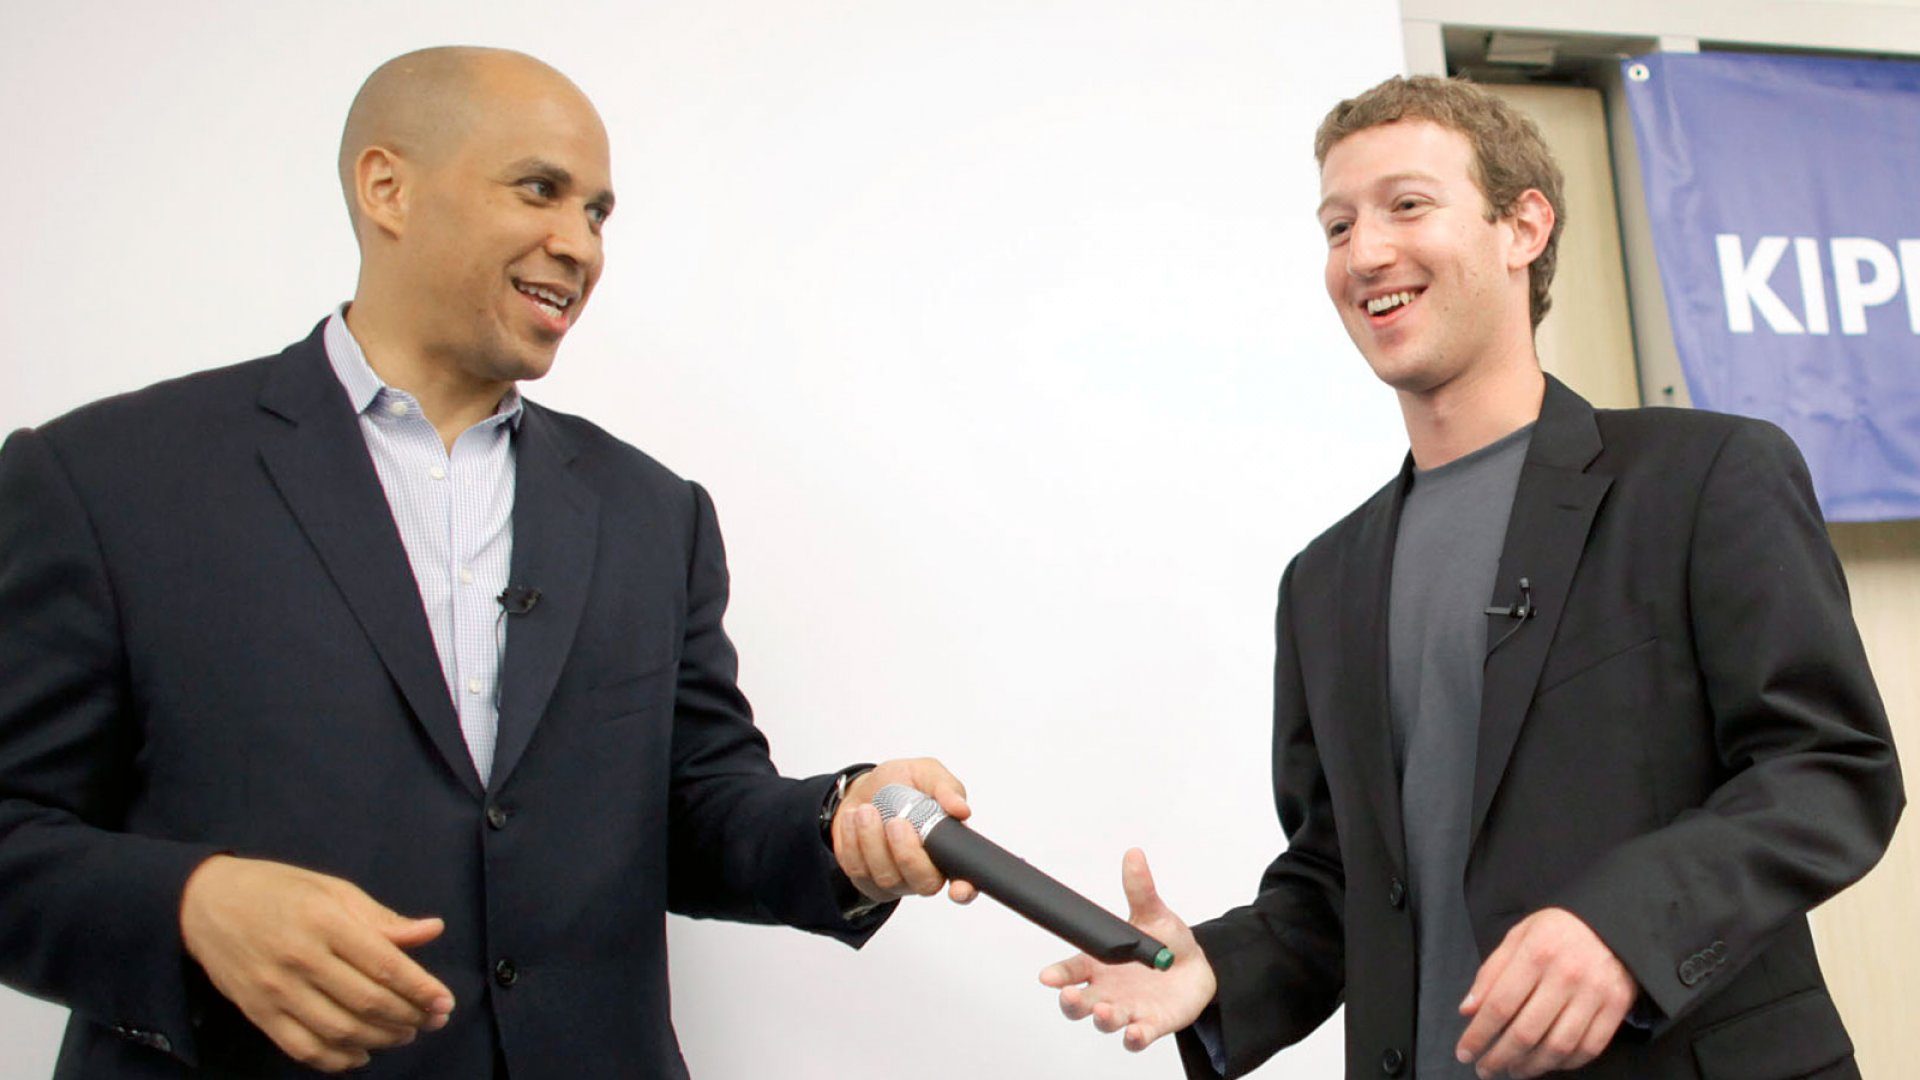 Examining Cory Booker's Tech Ties